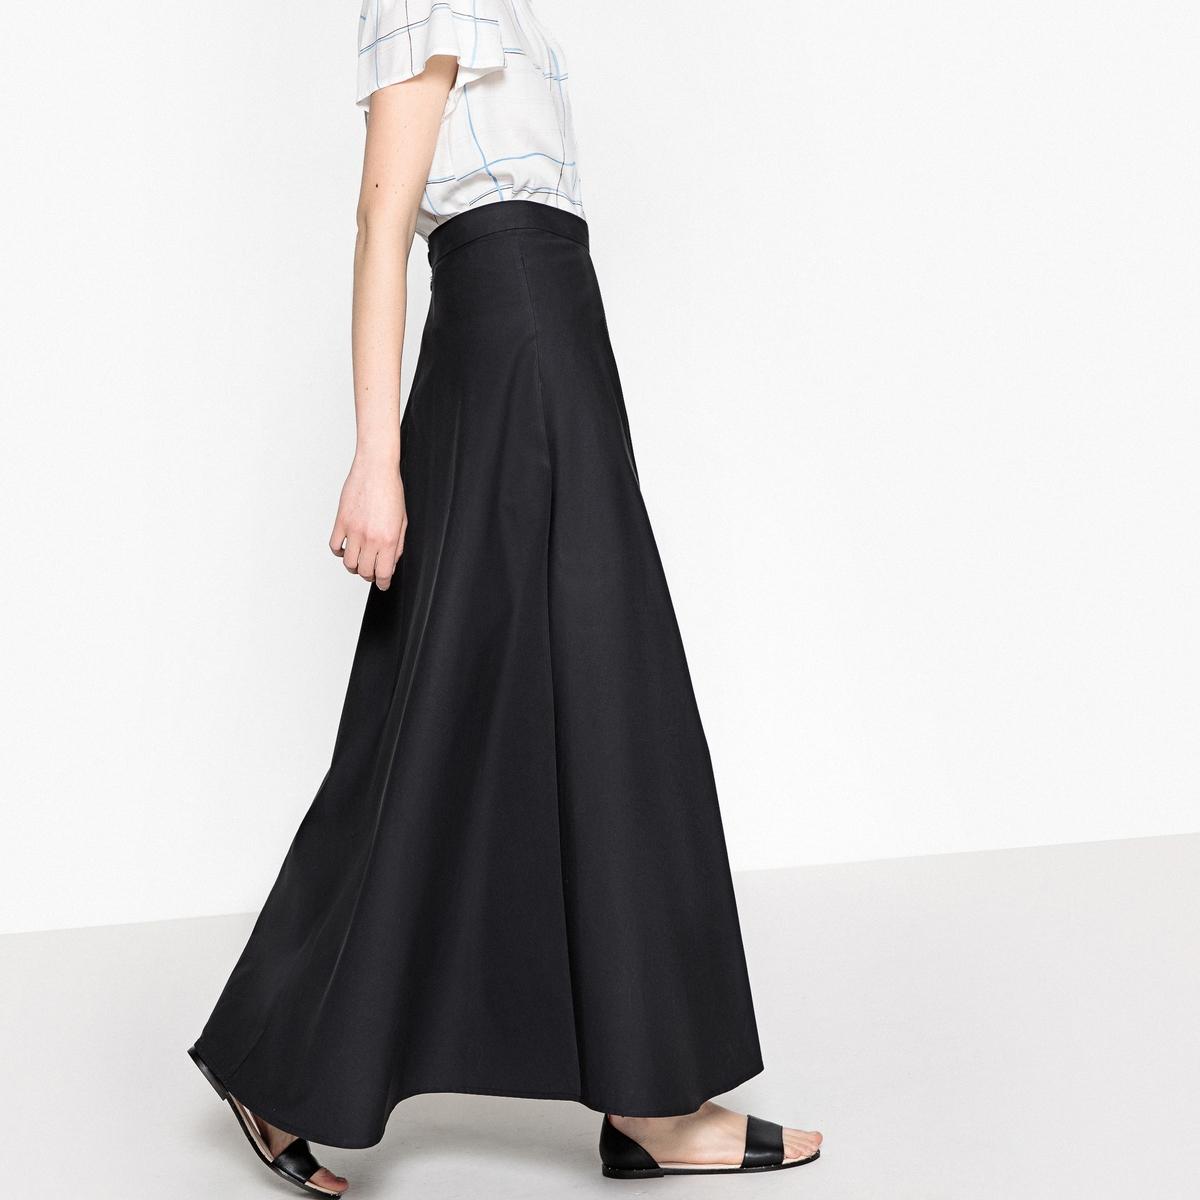 Falda larga de popelina 100% algodón